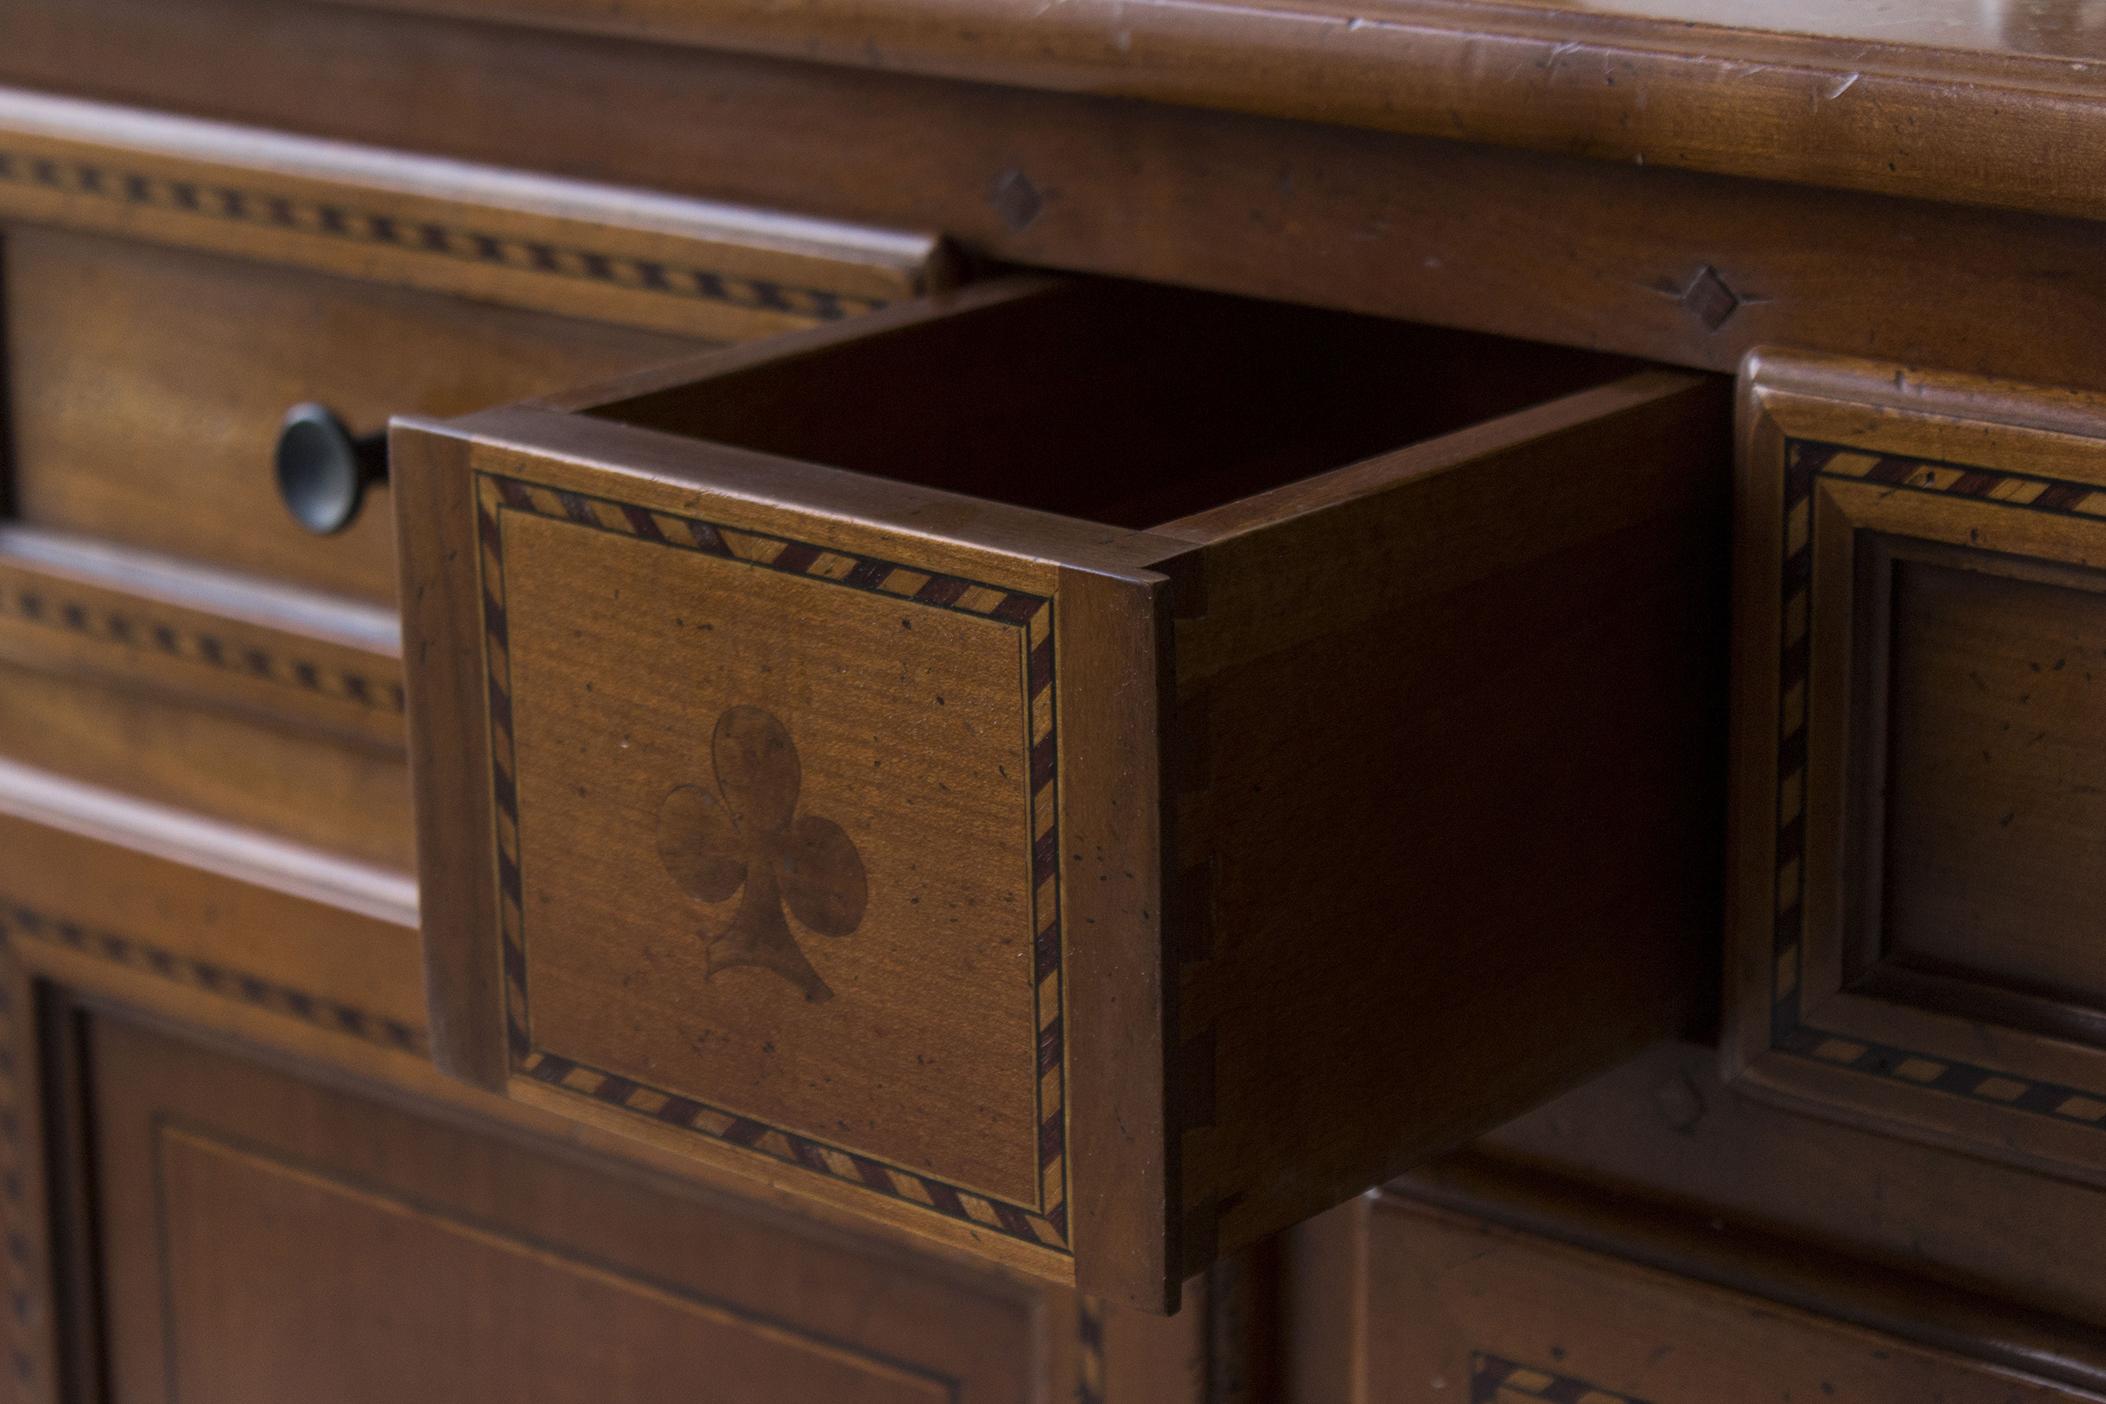 1481 - Vintage speelgoedkastje met klaverlaatje - Firma Zoethout_1.jpg